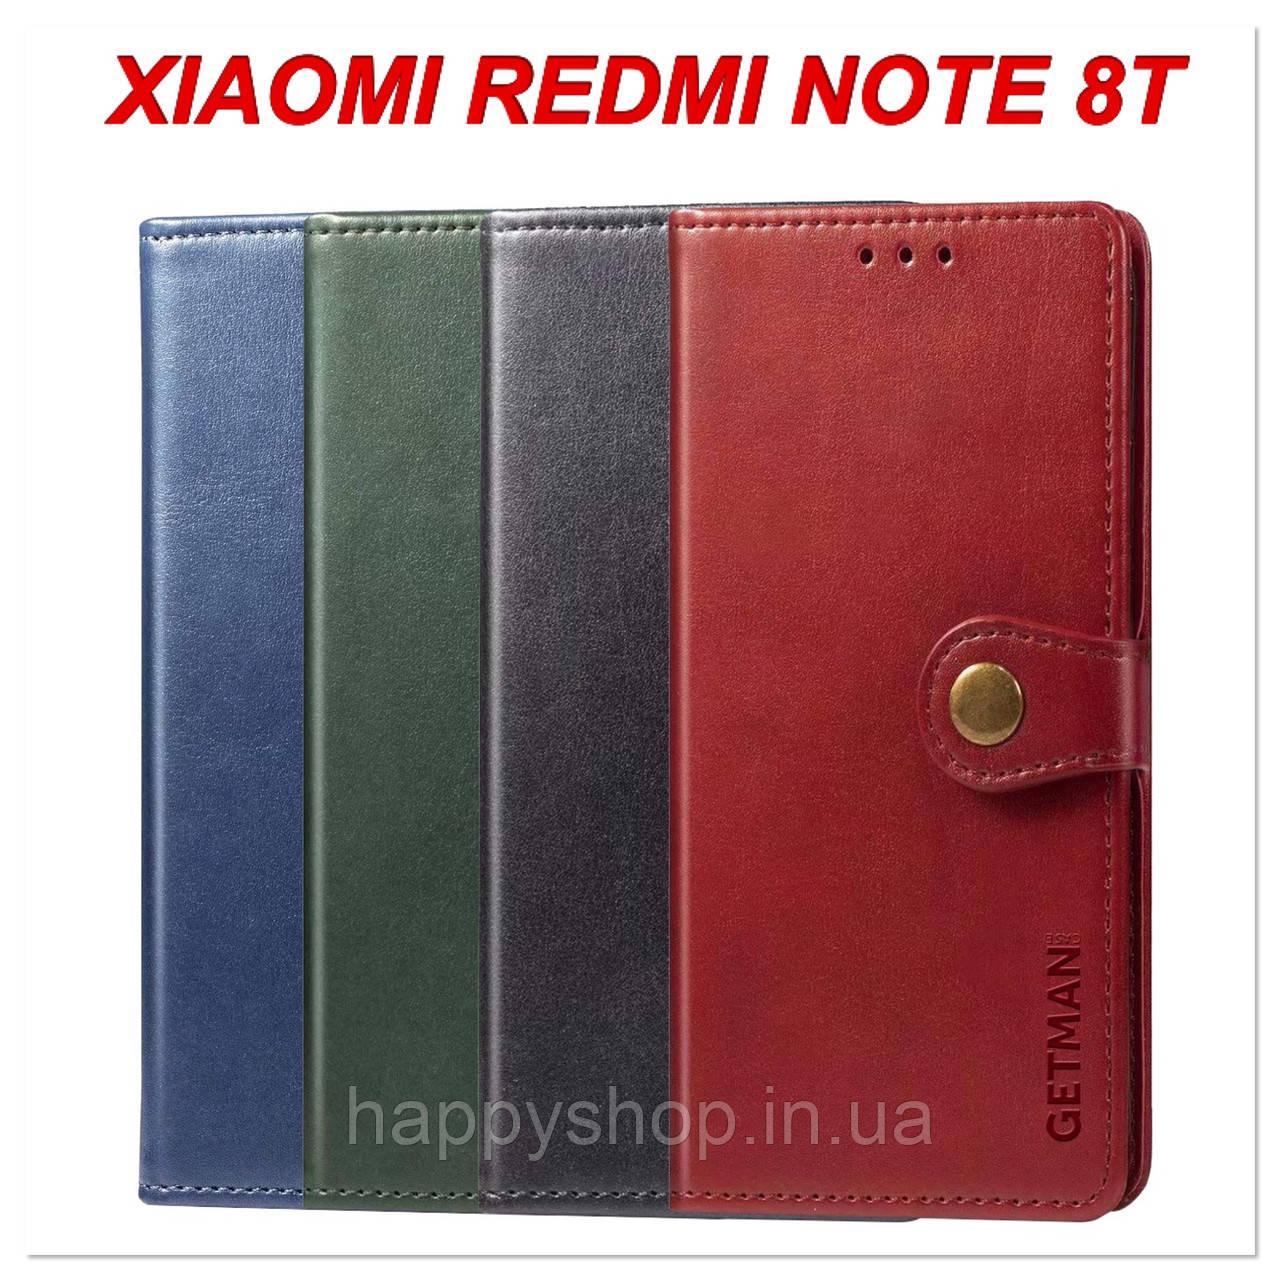 Чохол-книжка GETMAN Gallant для Xiaomi Redmi Note 8T